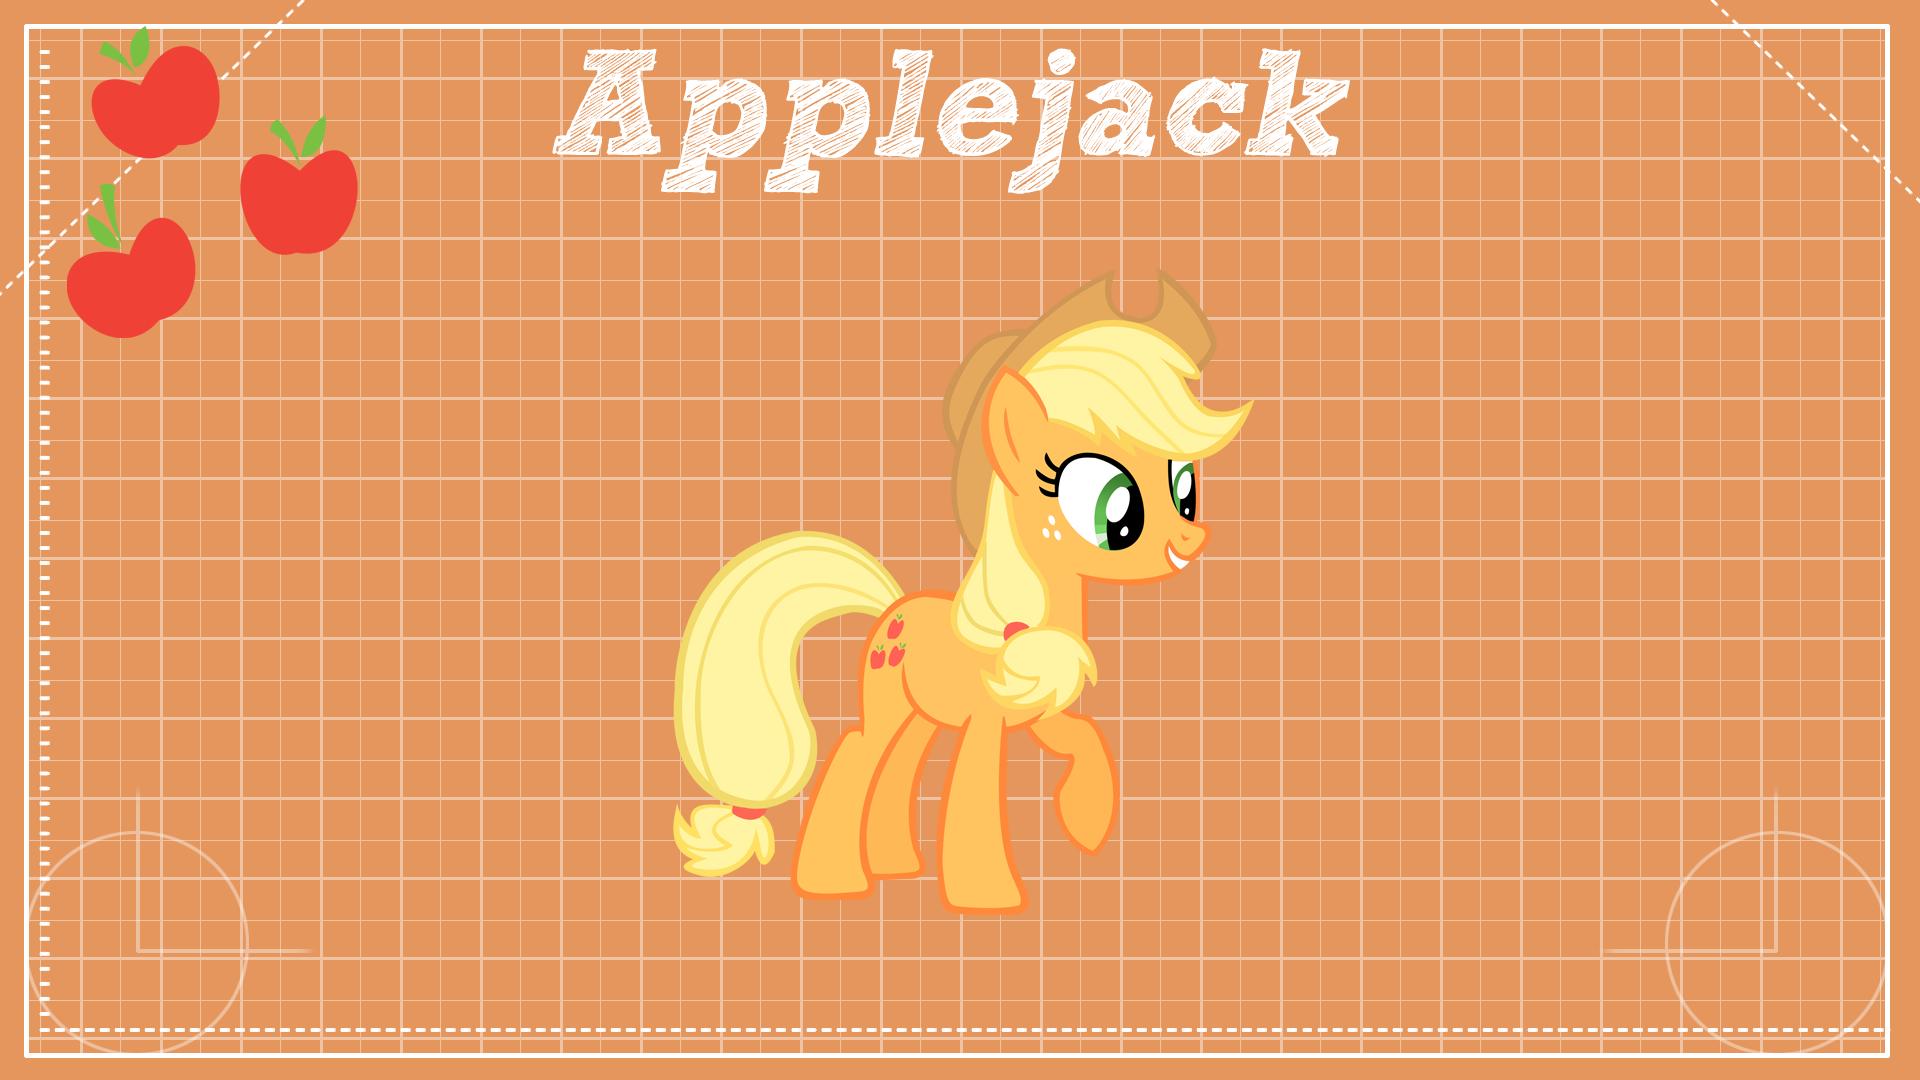 Applejack Design Clear by BlackGryph0n, ikonradx and Shelmo69